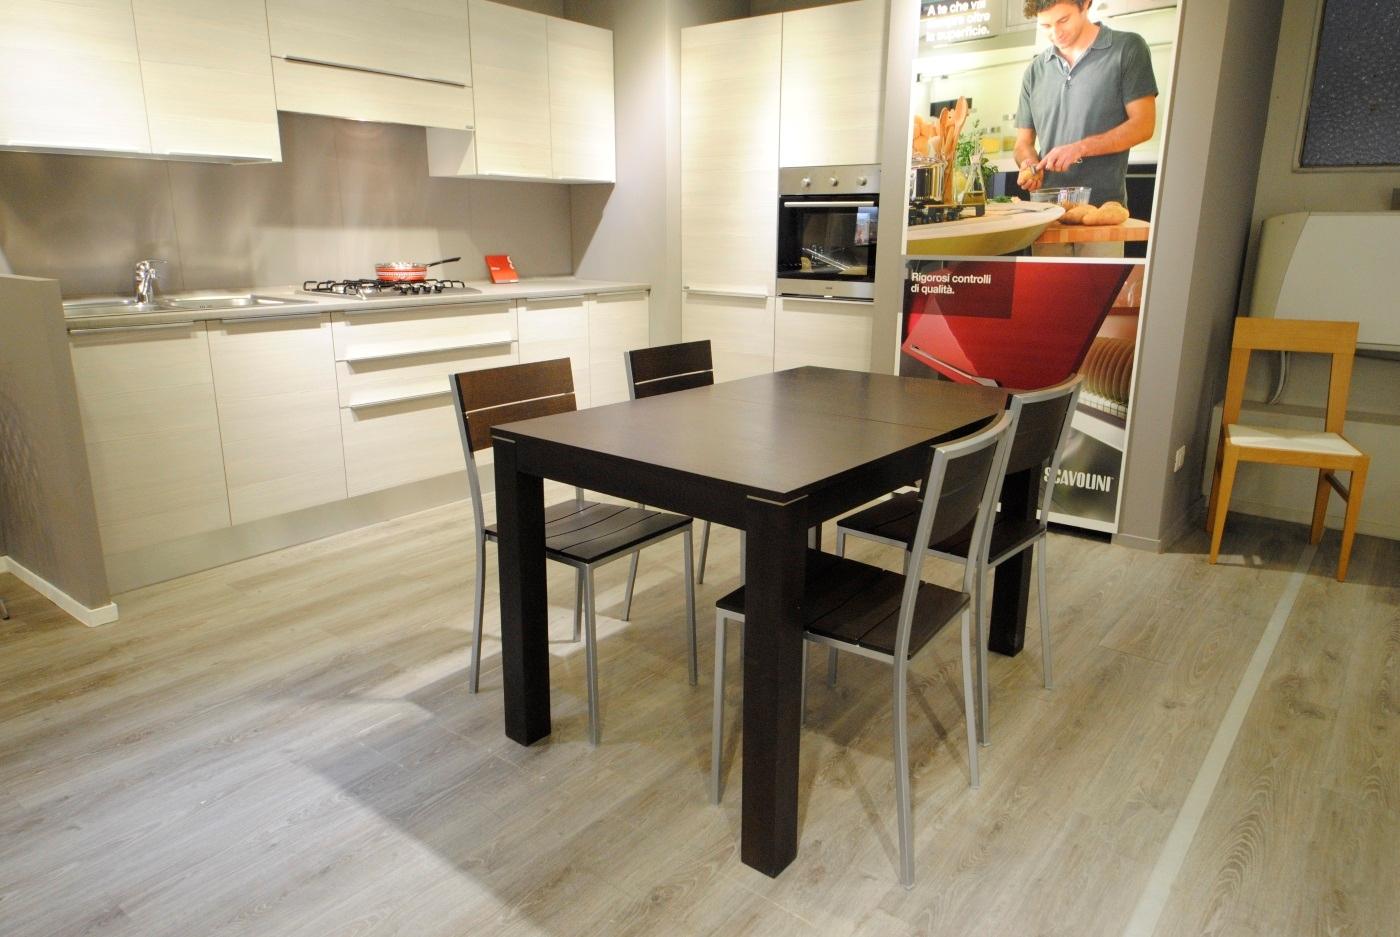 scavolini tavoli - 28 images - tavolo scavolini modello misfit fisso ...